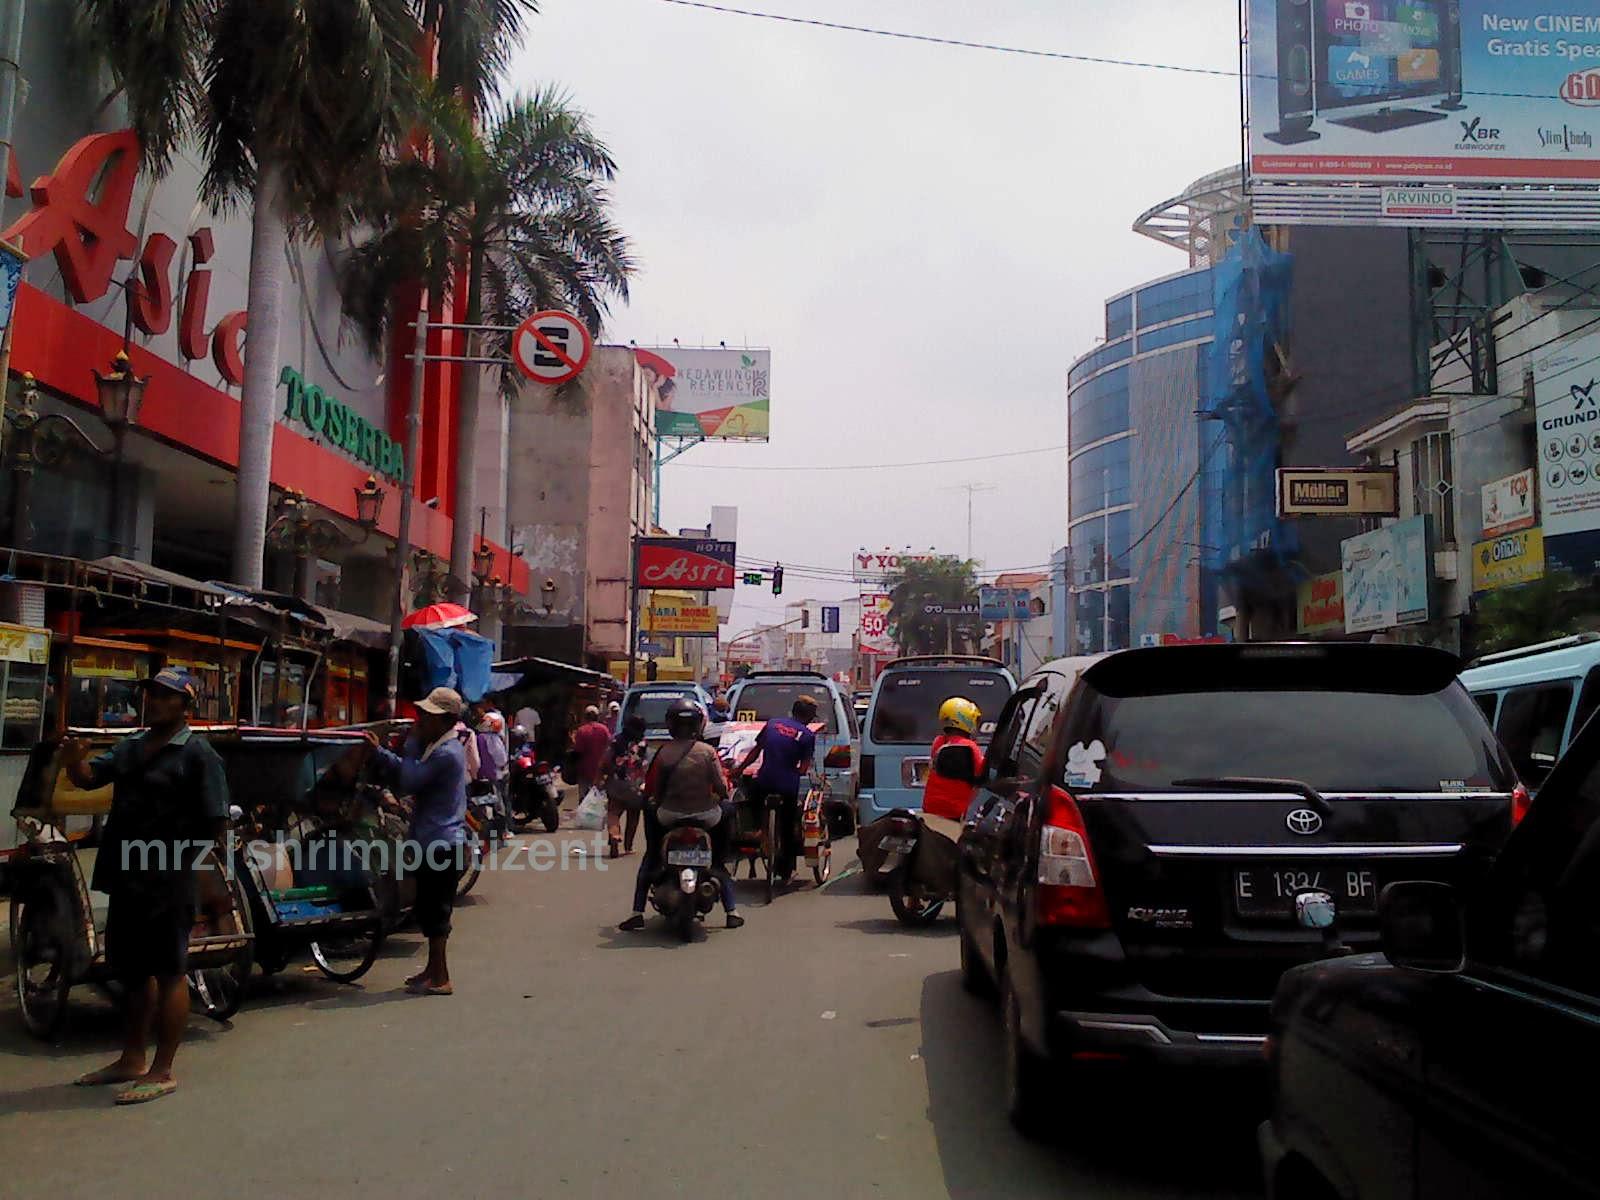 jl. Karanggetas Cirebon 2